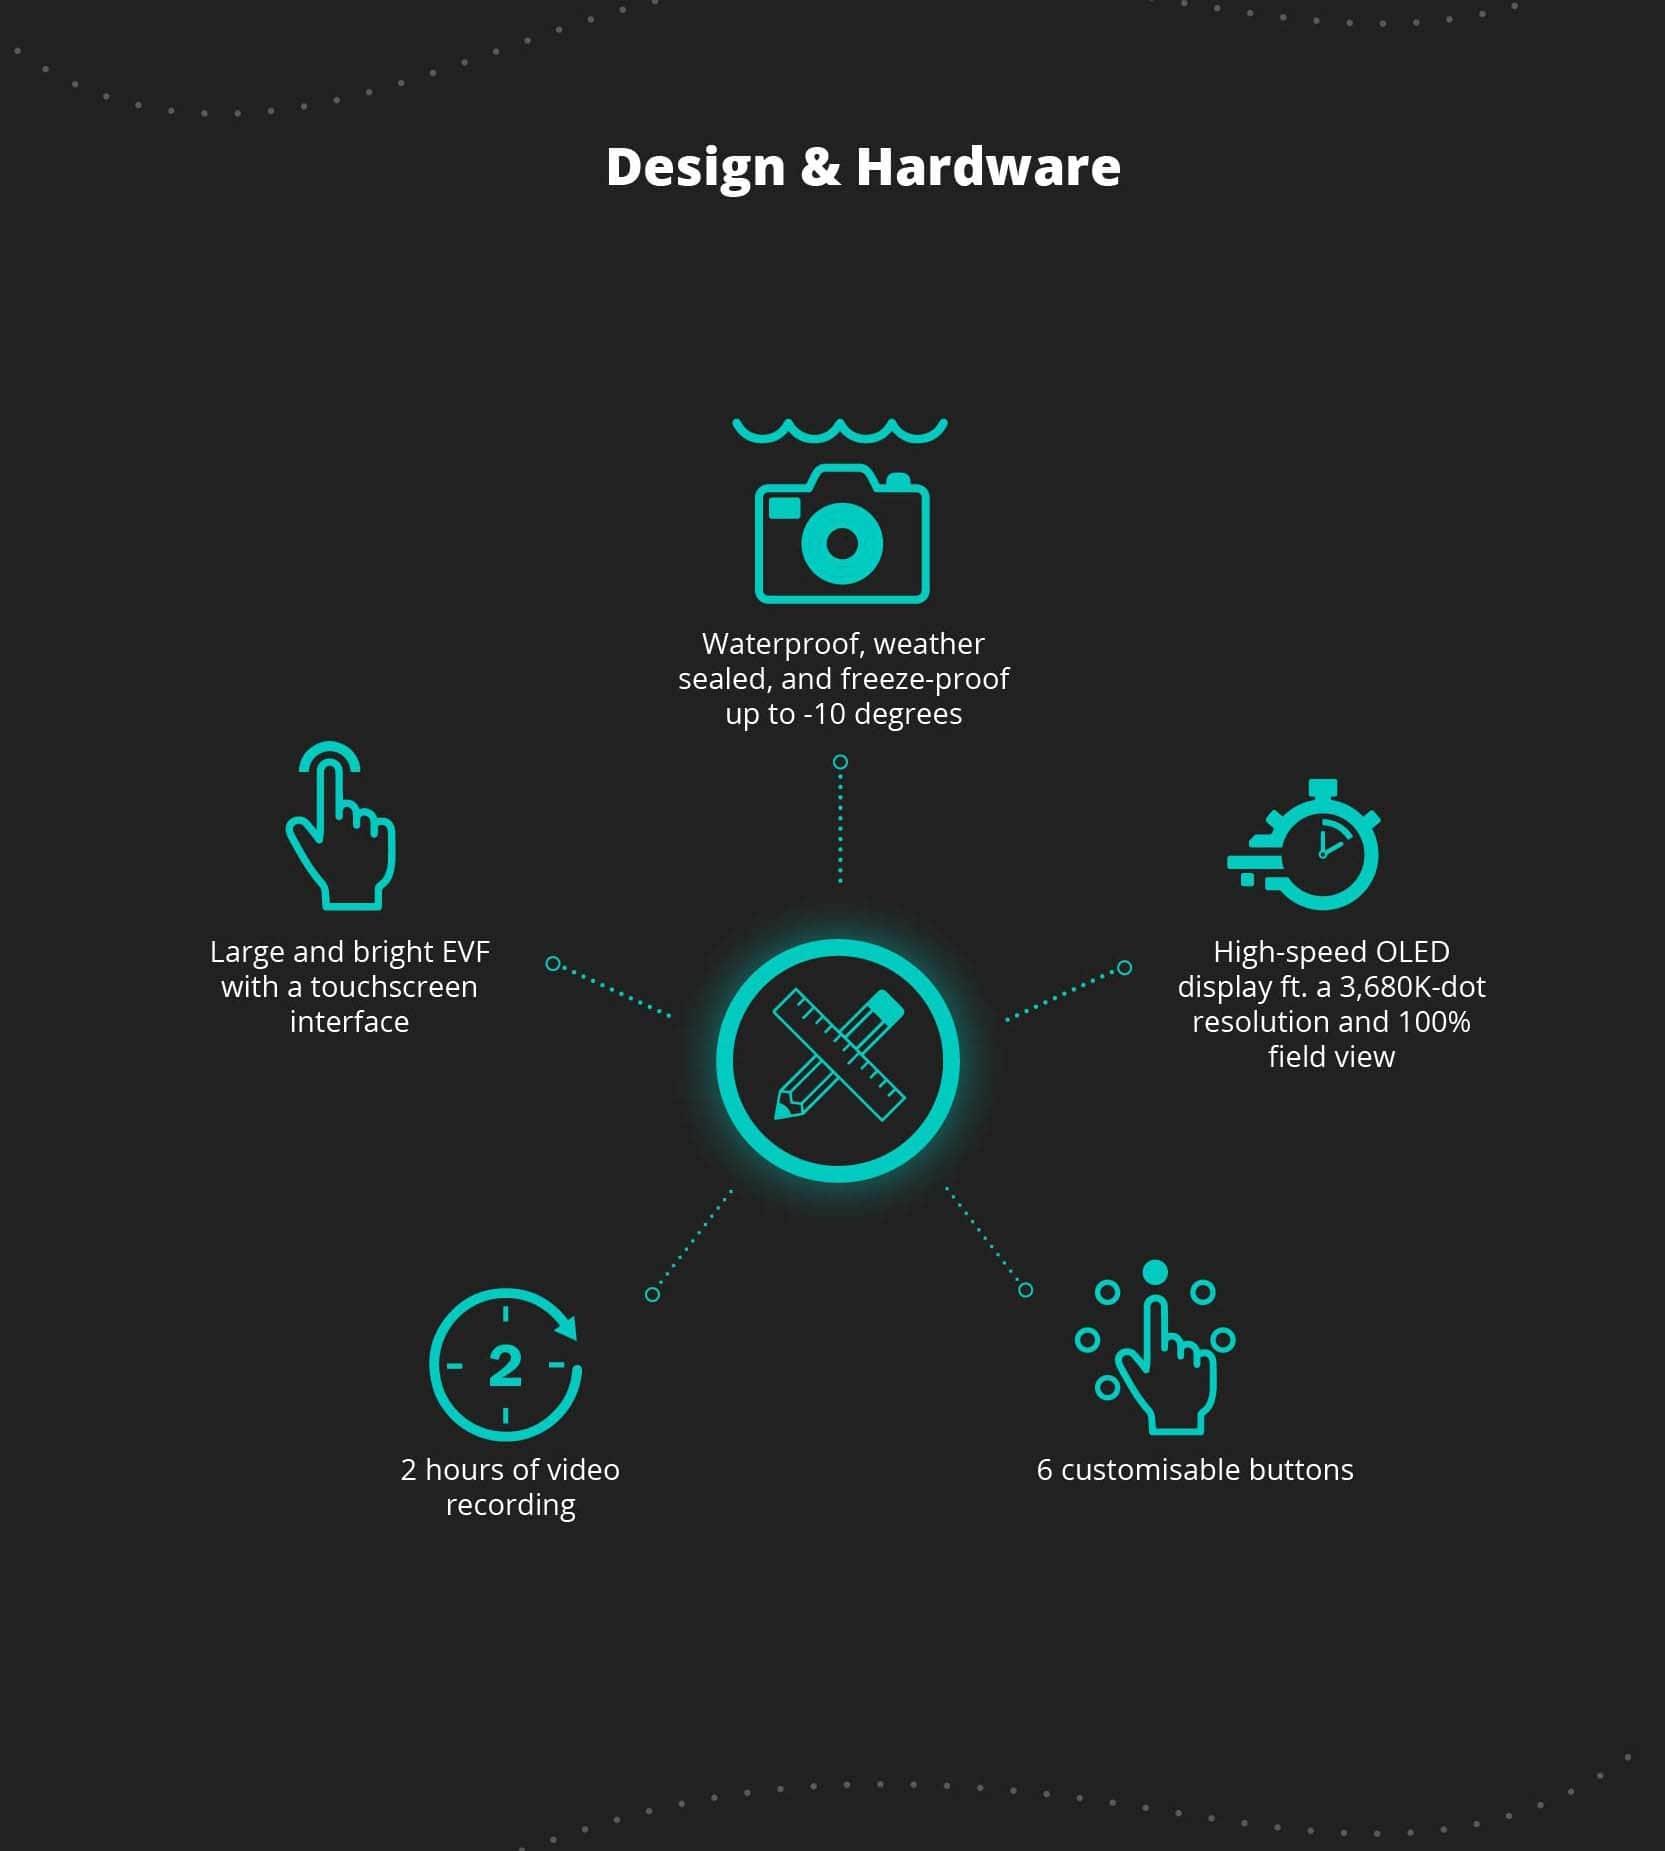 GH5 body, design and hardware. The design og GH5.